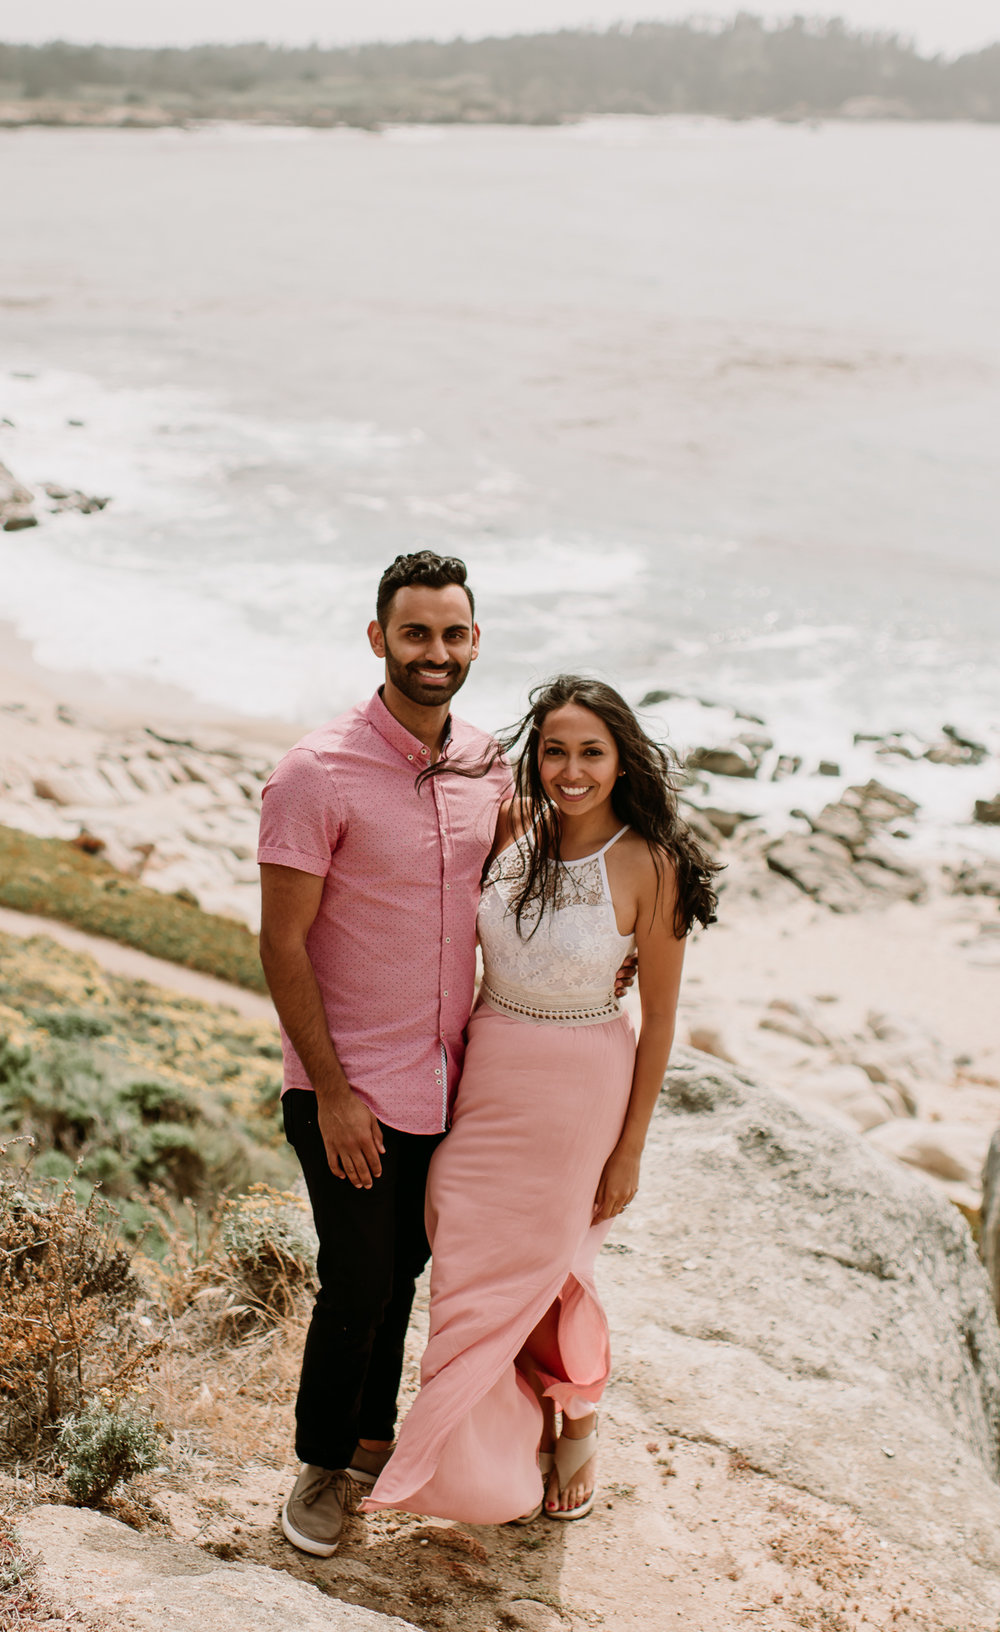 California Big Sur coast wedding photographer proposal